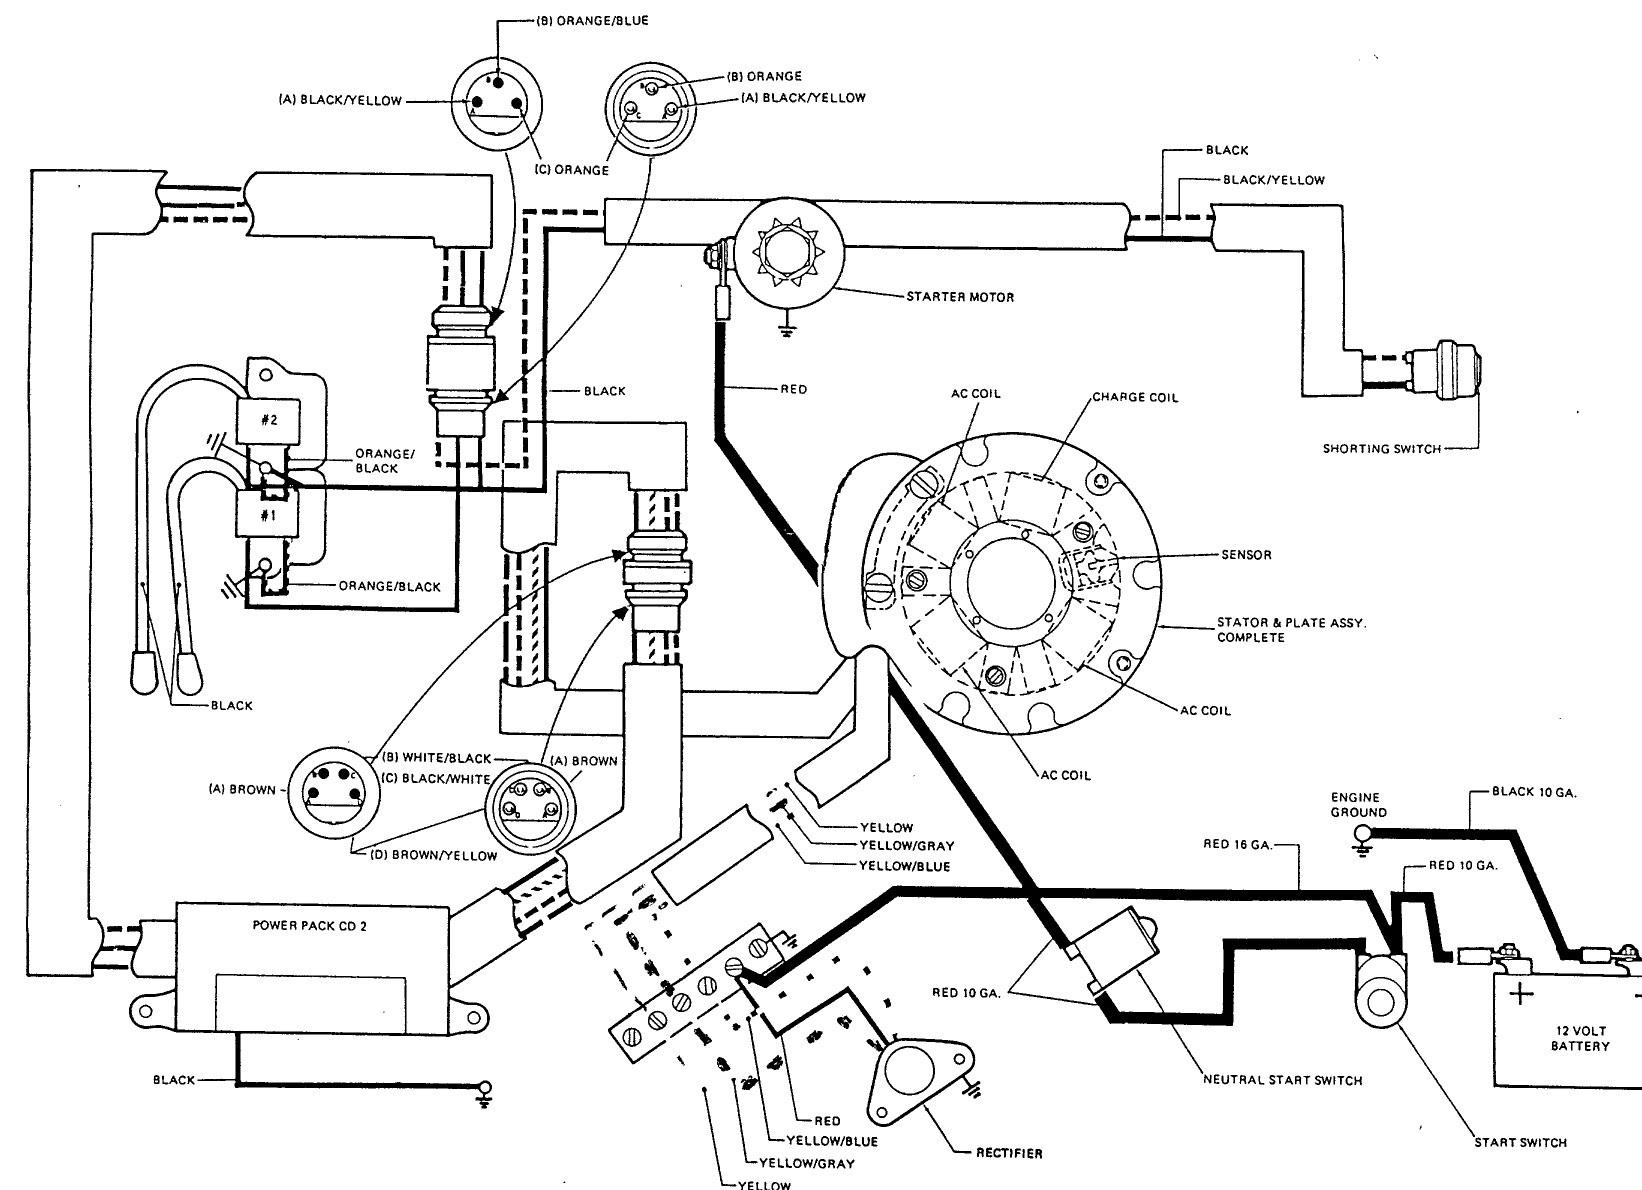 Jet Boat Engine Diagram Code Alarm Ca Wiring Diagram